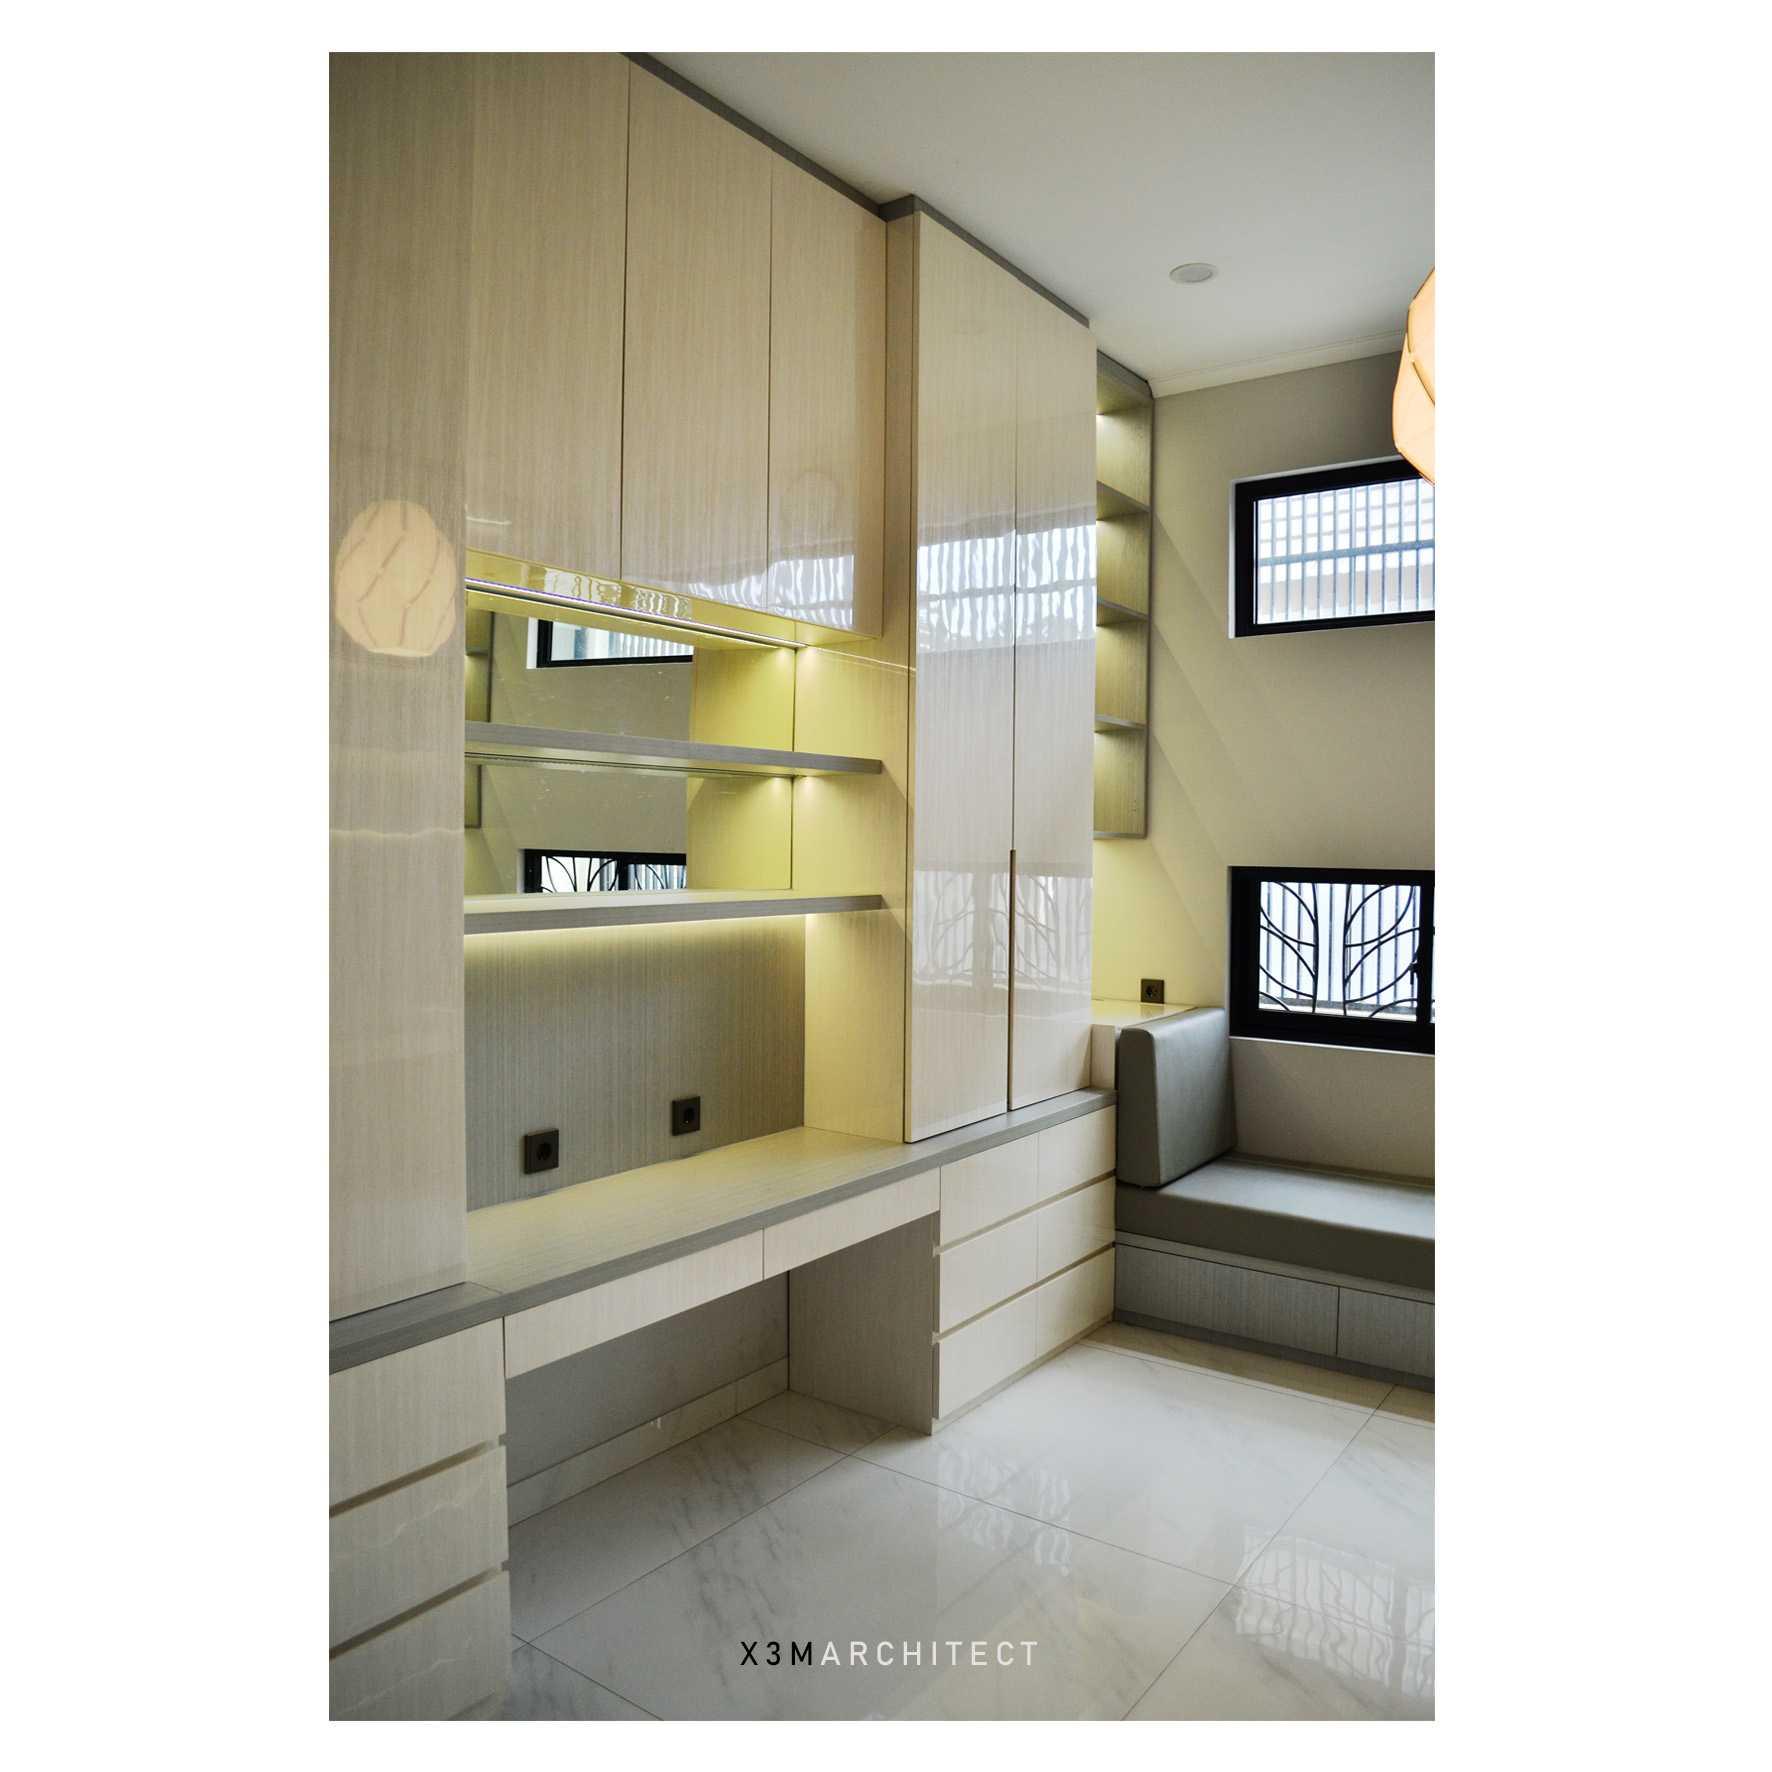 X3M Architects Nittaya A5 1 House Sampora, Kec. Cisauk, Tangerang, Banten 15345, Indonesia Sampora, Kec. Cisauk, Tangerang, Banten 15345, Indonesia X3M-Architects-Nittaya-A5-1-House   80365